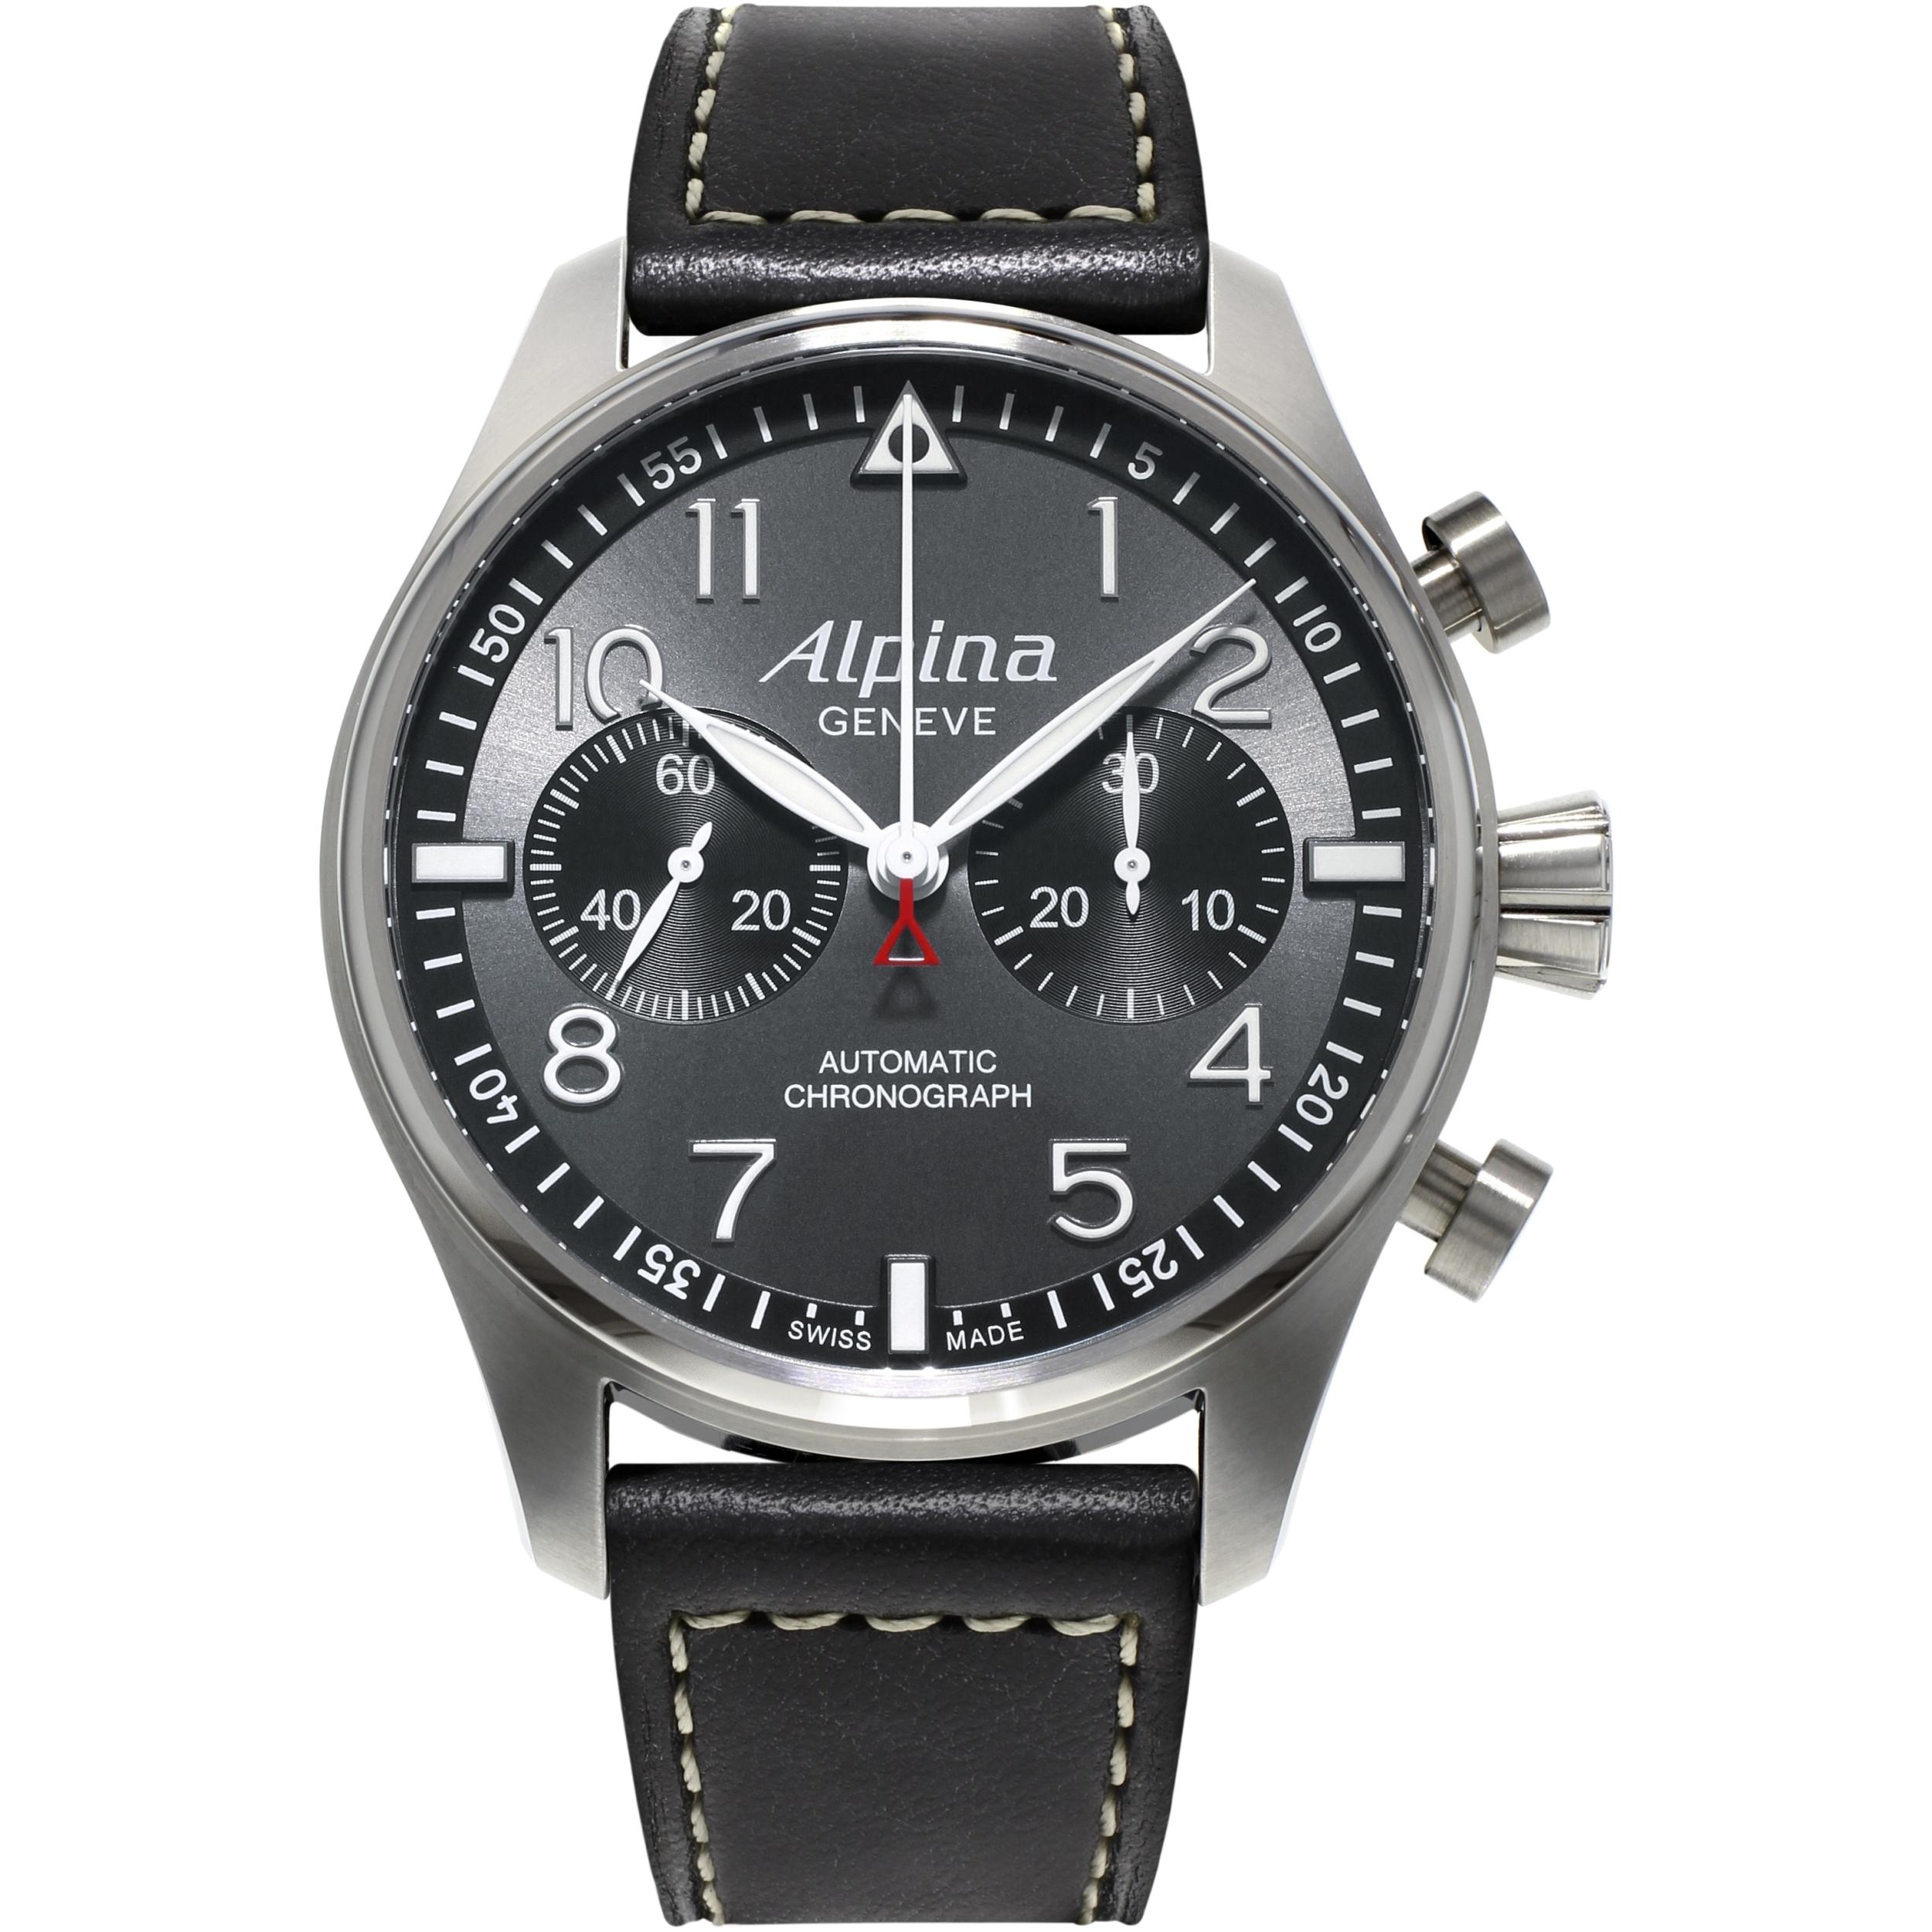 Gents Alpina Startimer Pilot Chronograph Watch ALGBS - Alpina watch reviews